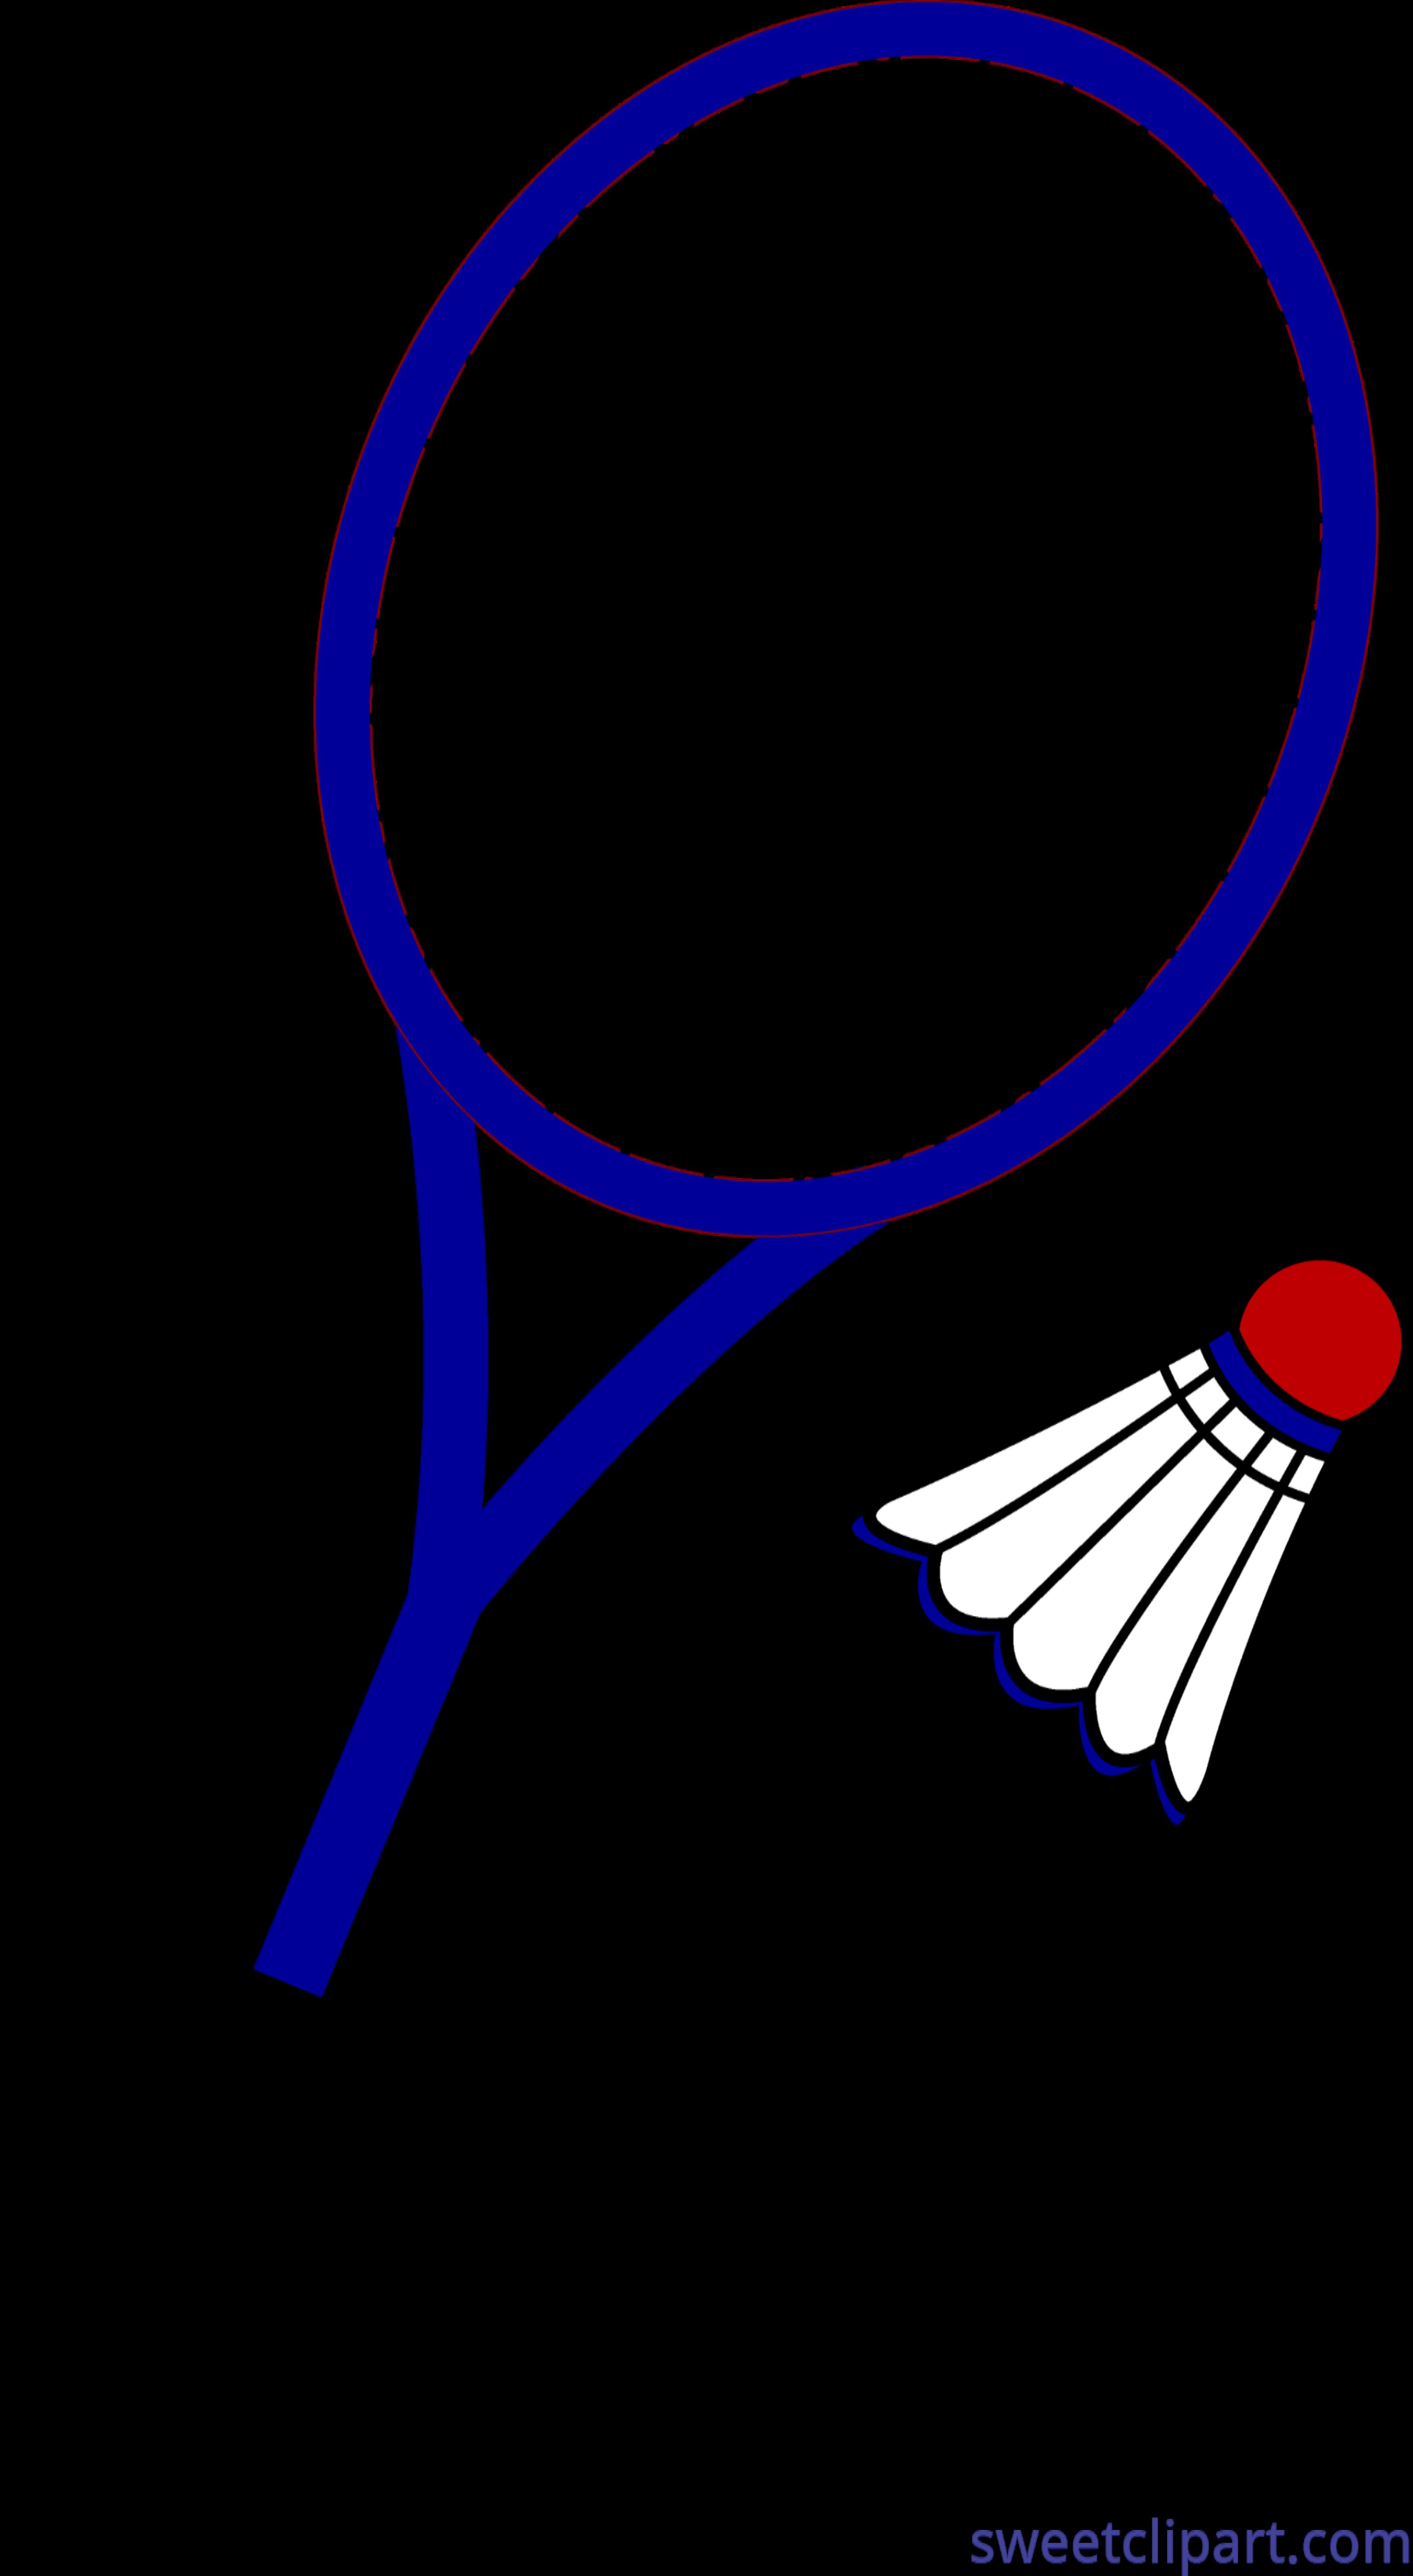 badminton clip art sweet clip art rh m sweetclipart com badminton clipart black and white badminton clipart png